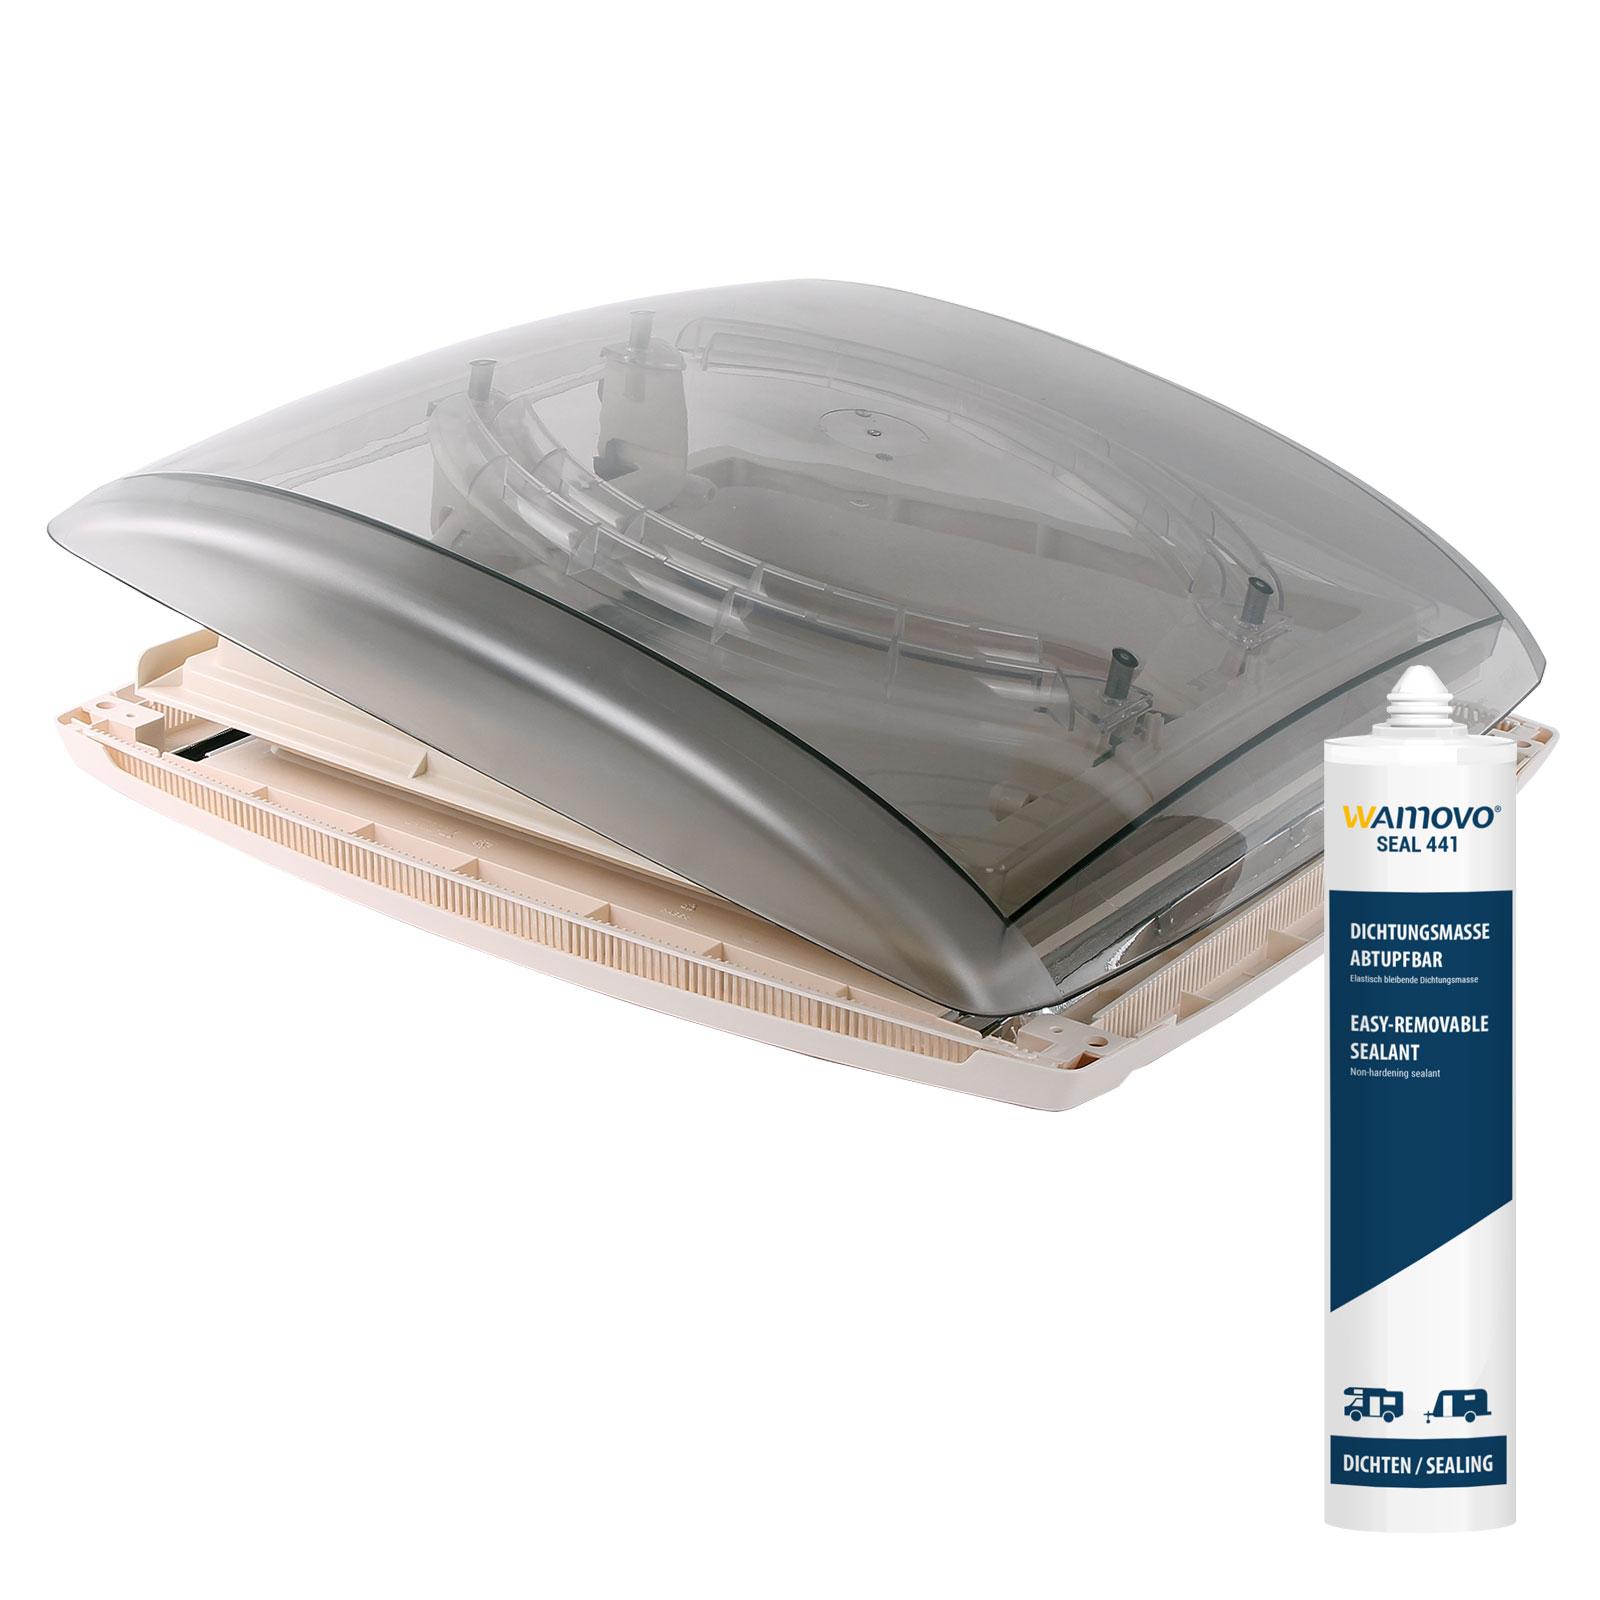 MPK Vision Vent M pro Dachhaube Dachstärke 24-56 mm 47P inkl. Dichtmasse